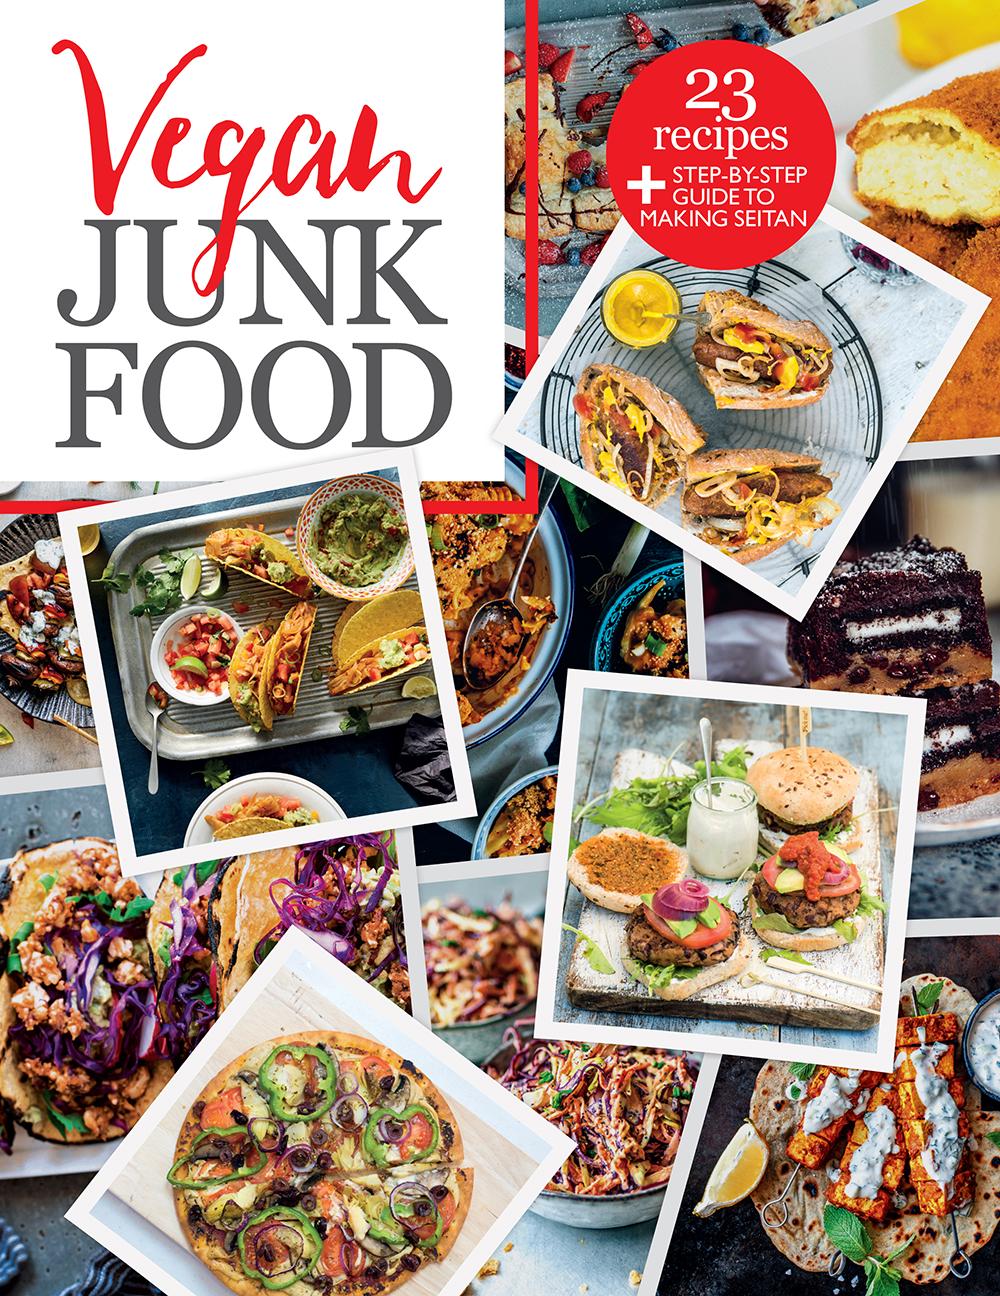 Vegan Food & Living July 2018